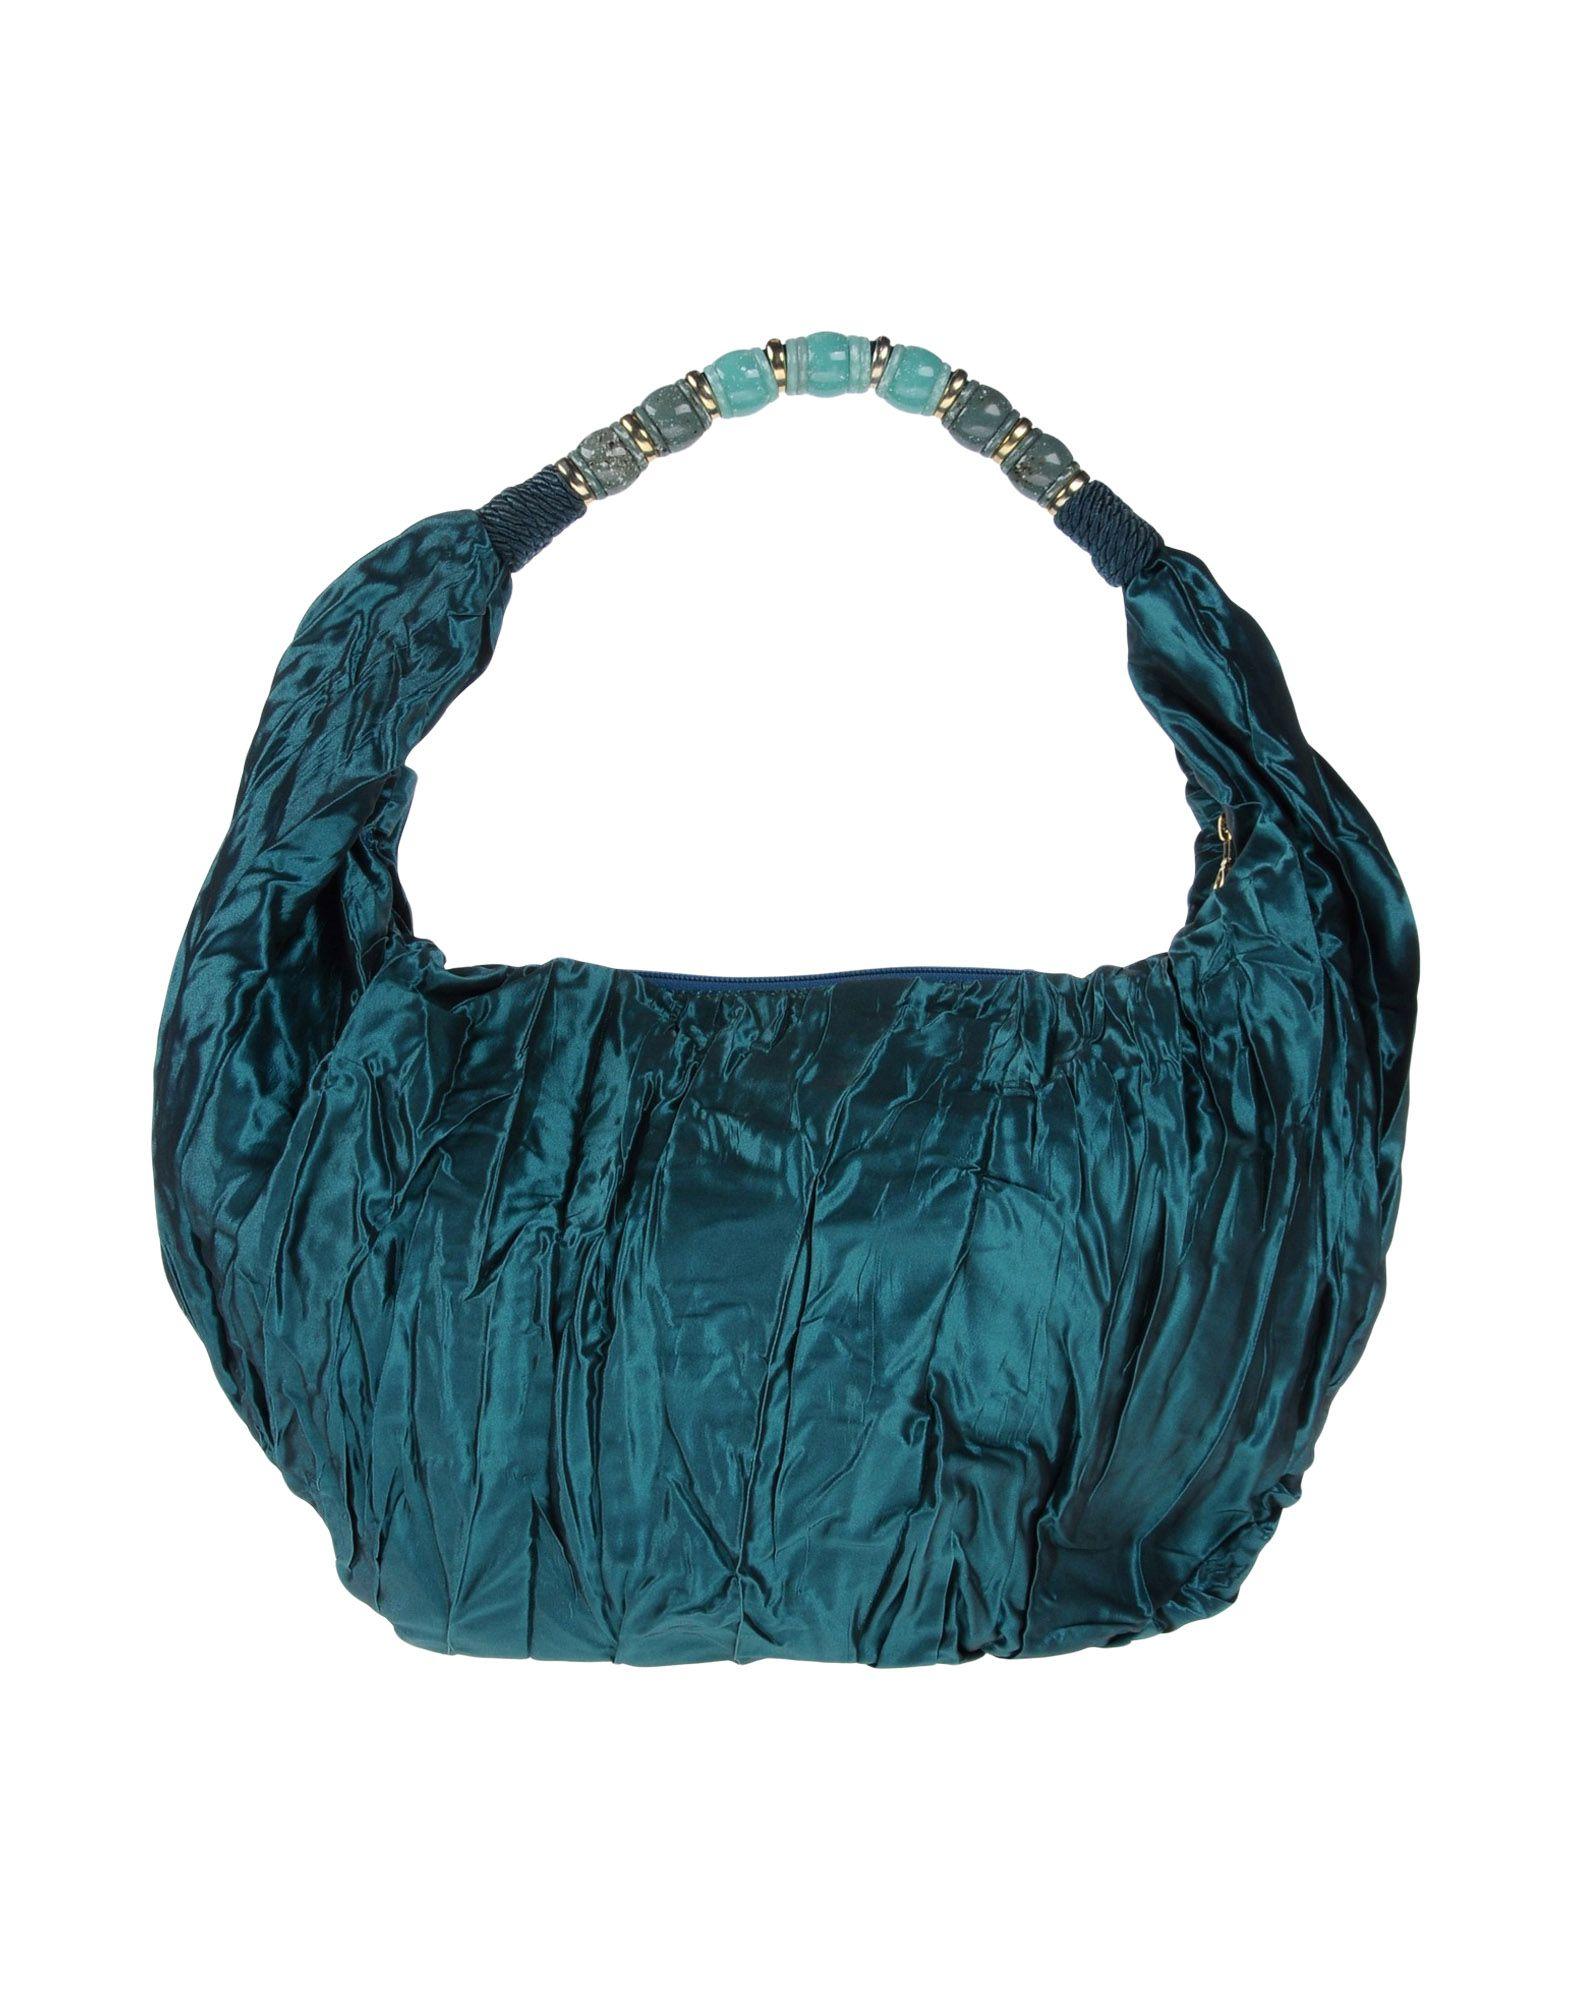 MADDALENA MARCONI Сумка на руку francesco marconi ремень francesco marconi 191am cocco jeans синий